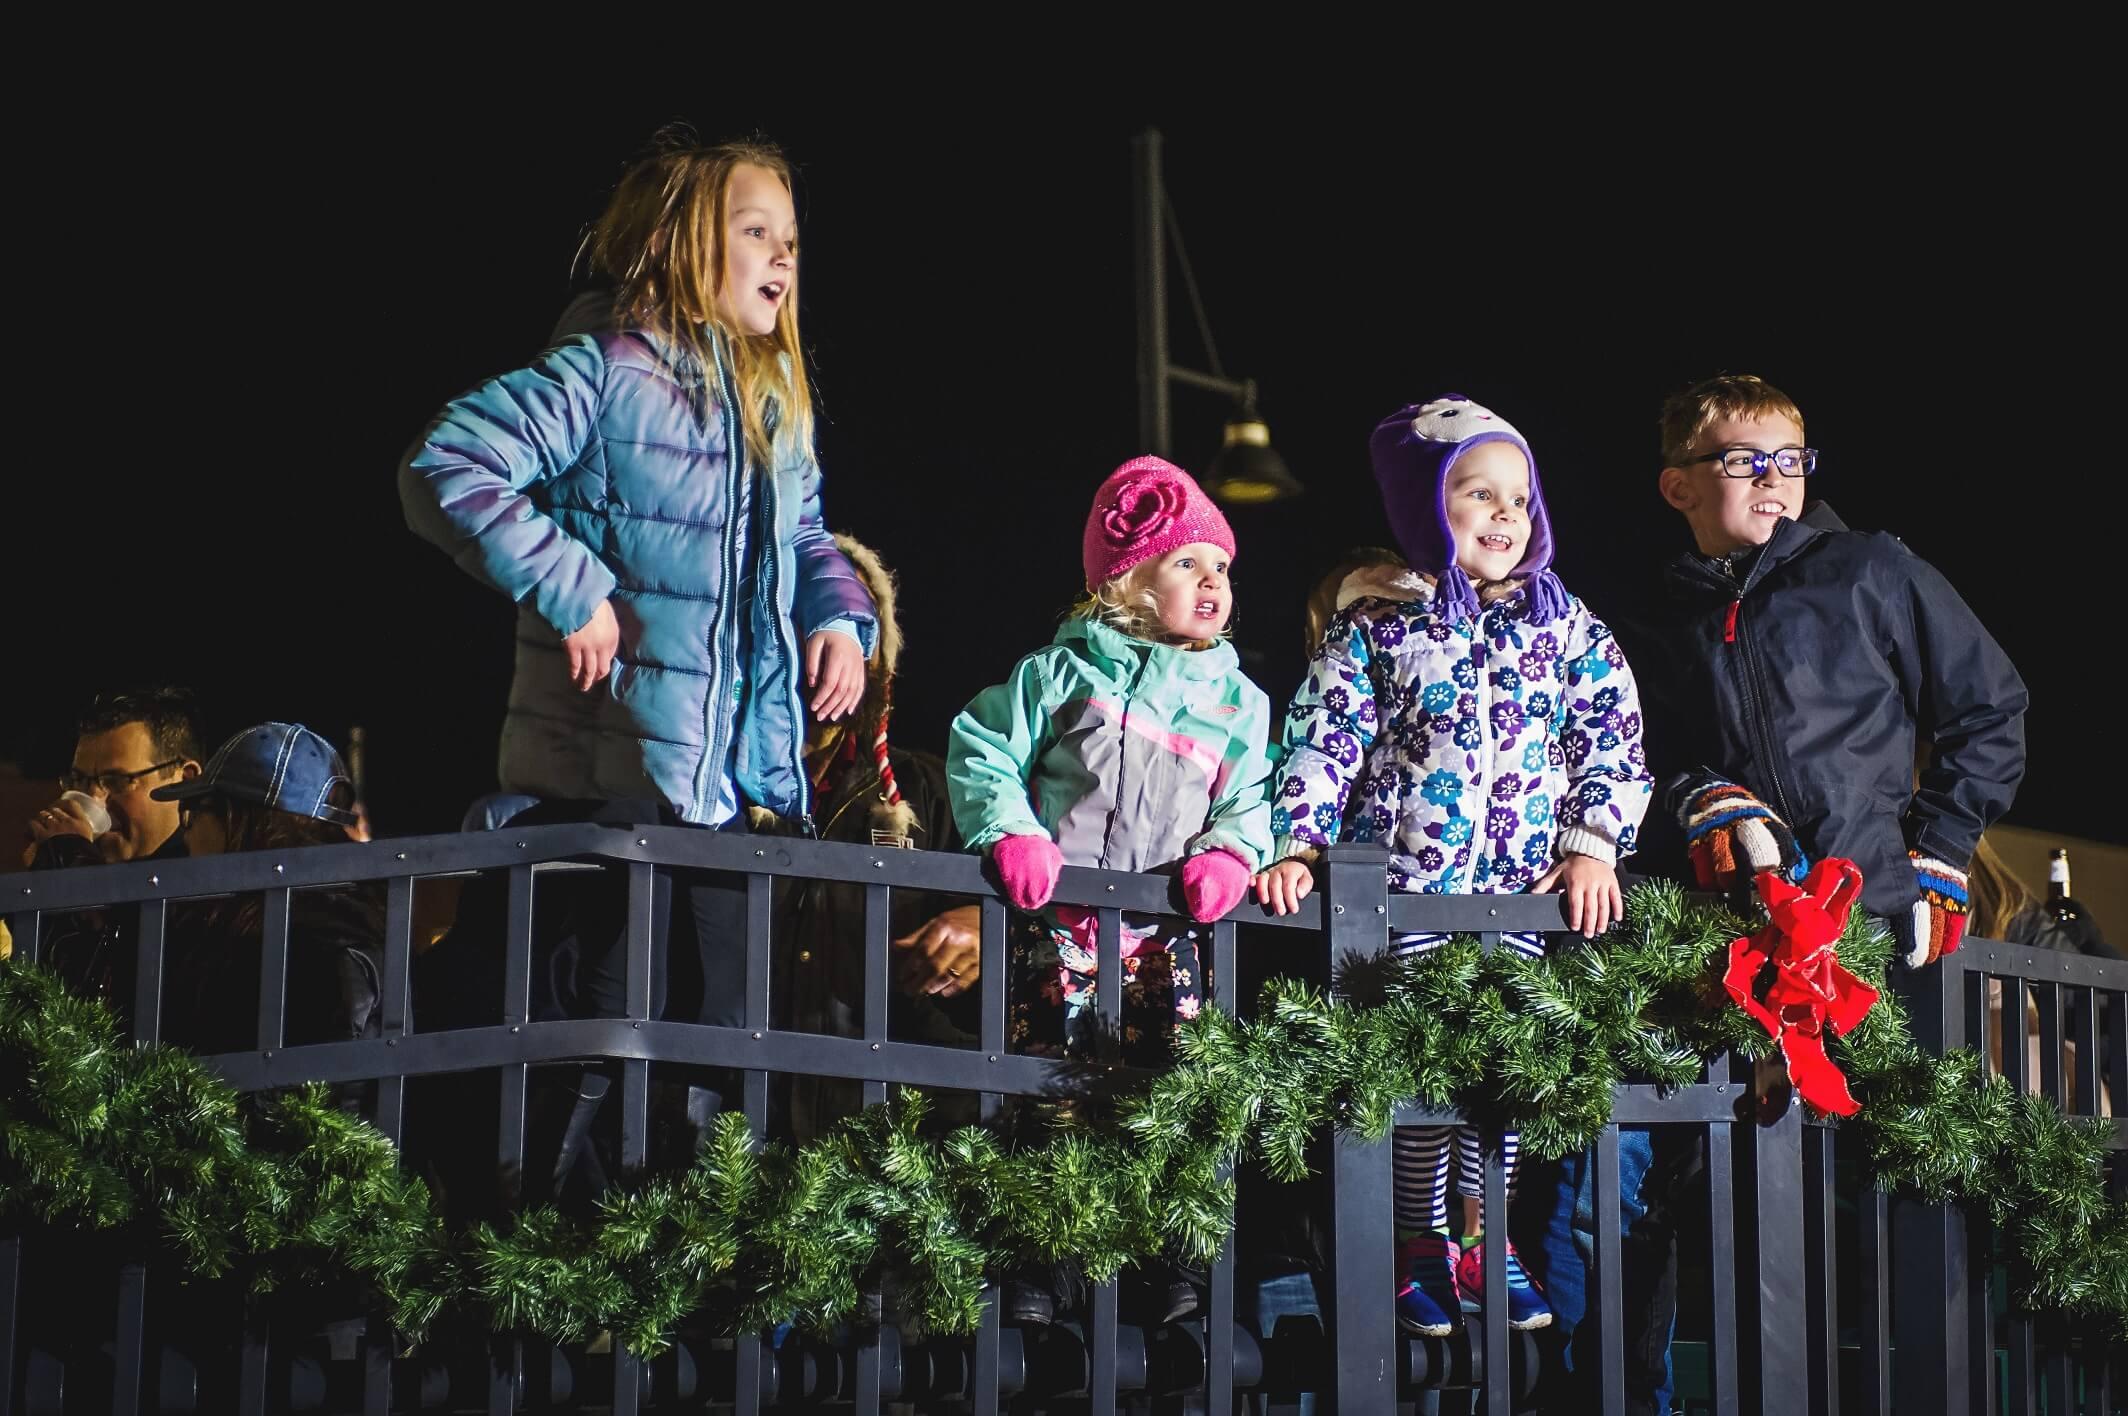 /holiday-shopping-winter-fun-oswego-illinois